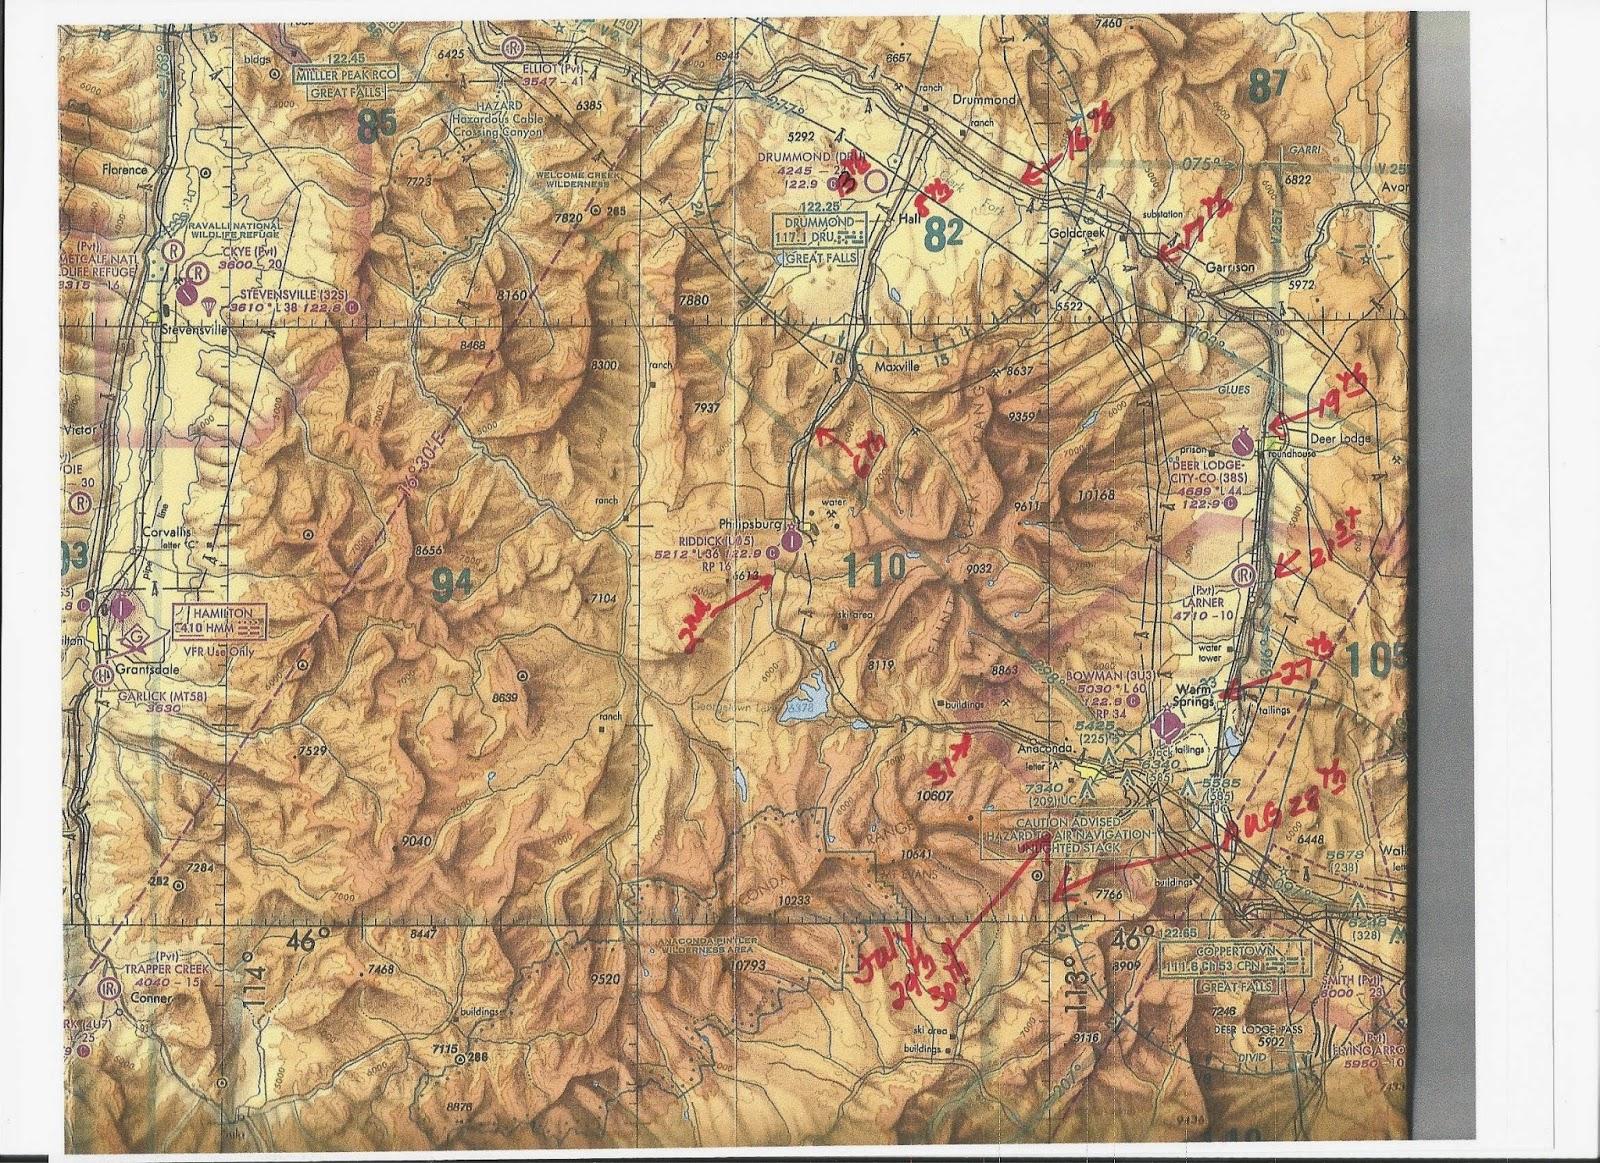 single men in granite county Granite bay ca demographics data  figure 31 shows the single men in each area granite  percent of population who was born in another country of 270%, granite.